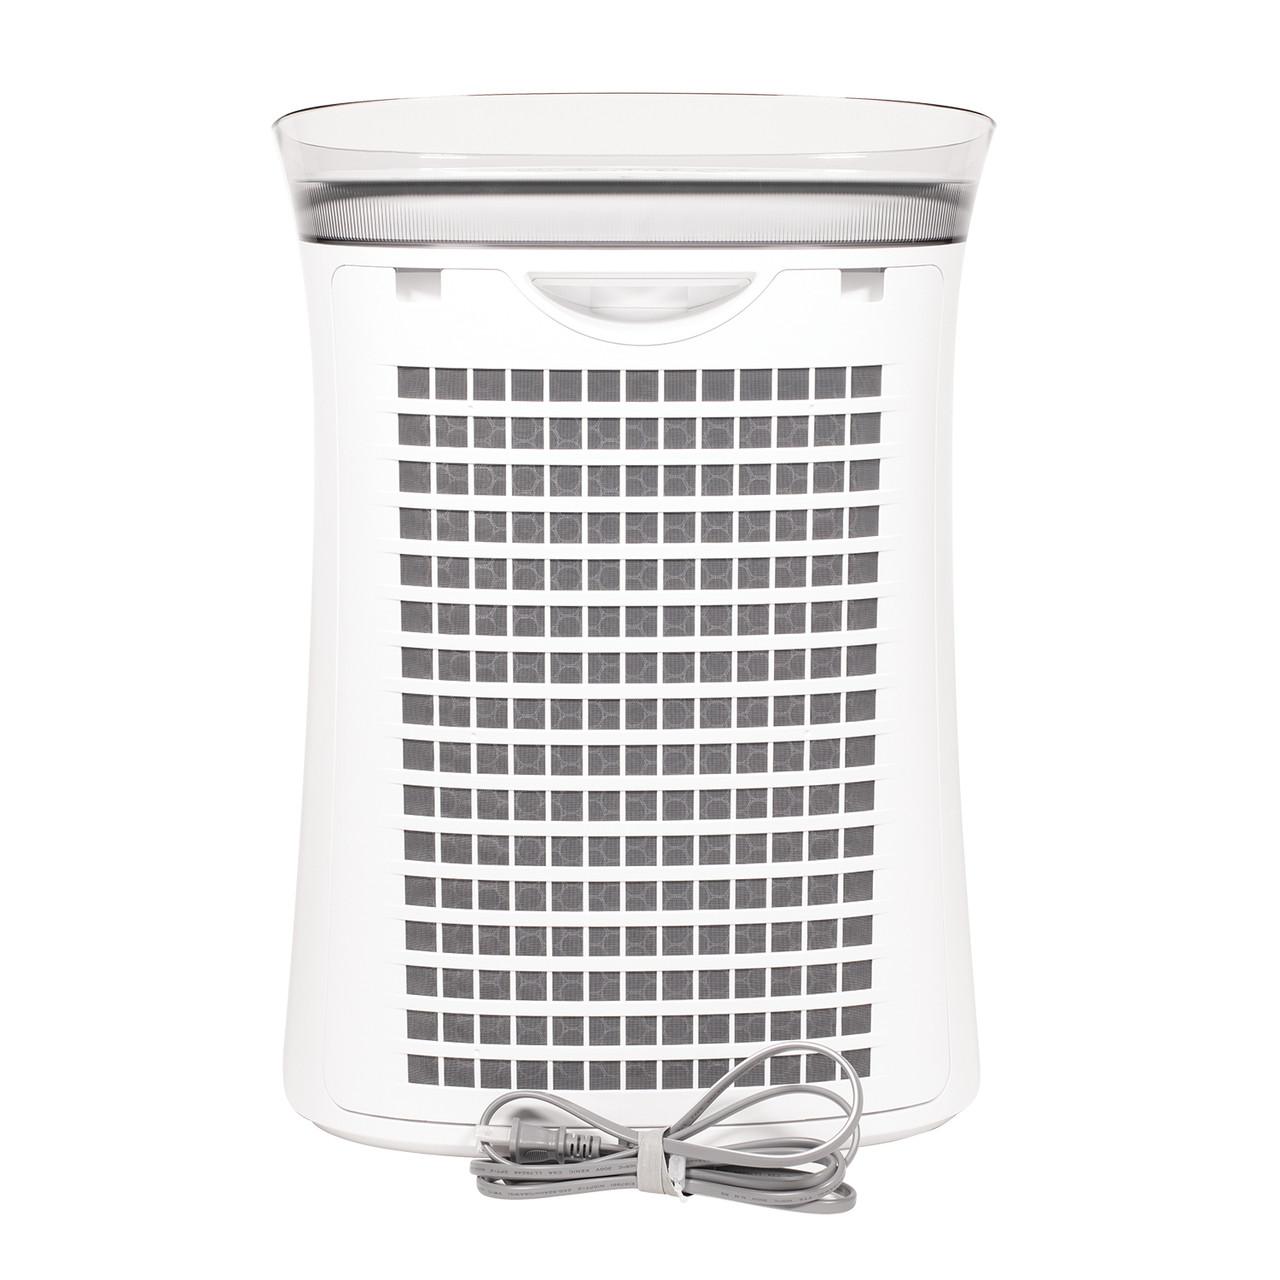 Sharp True HEPA Air Purifier for Medium-Sized Rooms (FPK50UW) – back view